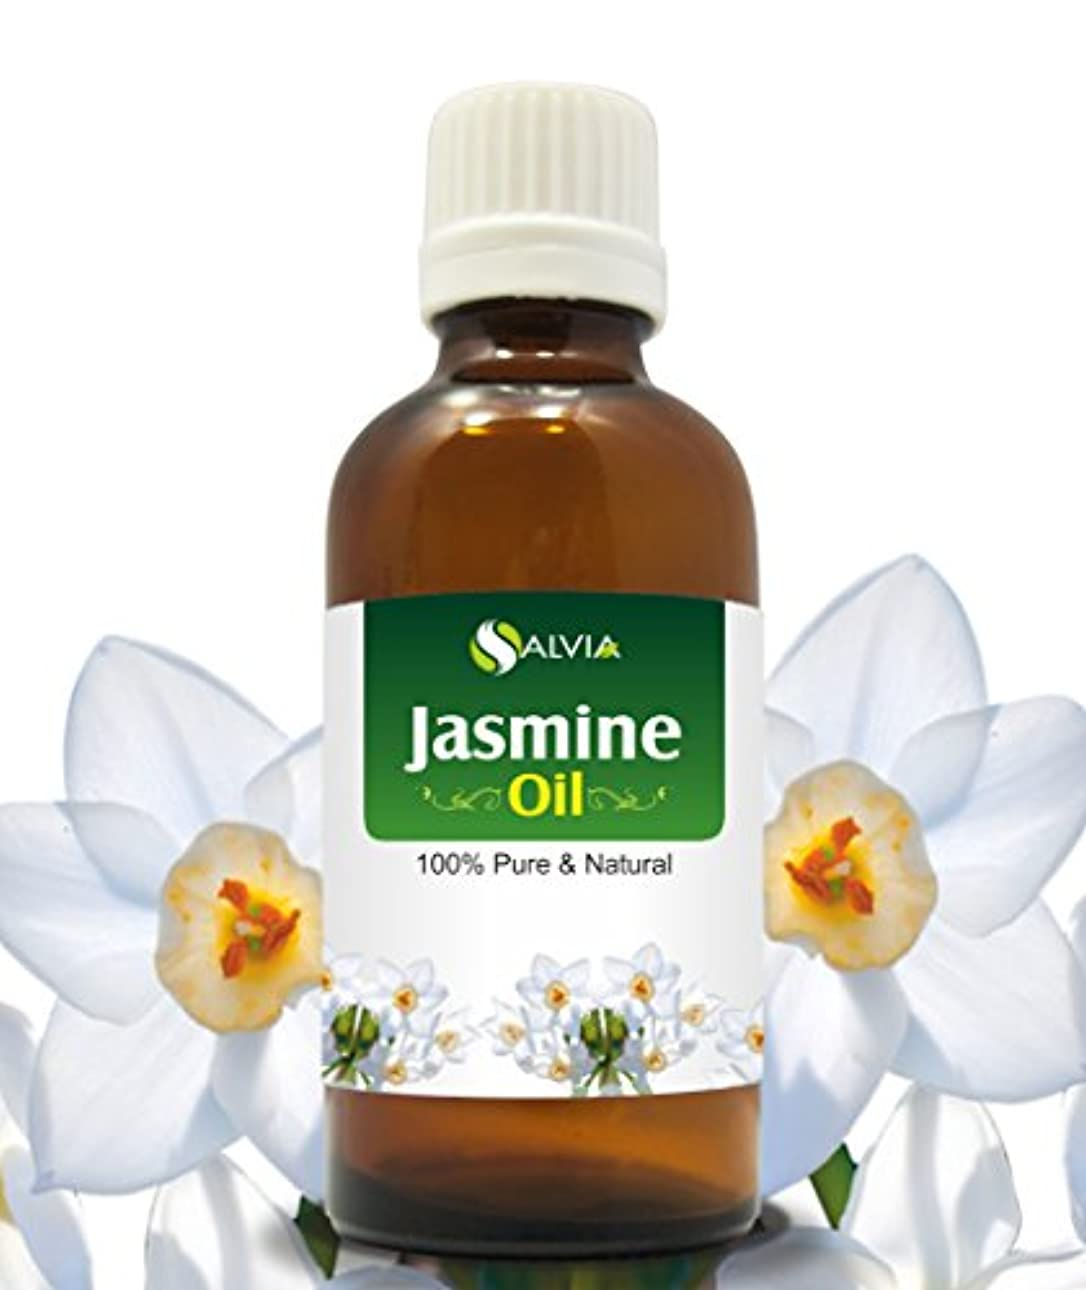 JASMINE OIL 100% NATURAL PURE UNDILUTED UNCUT ESSENTIAL OILS 50ML